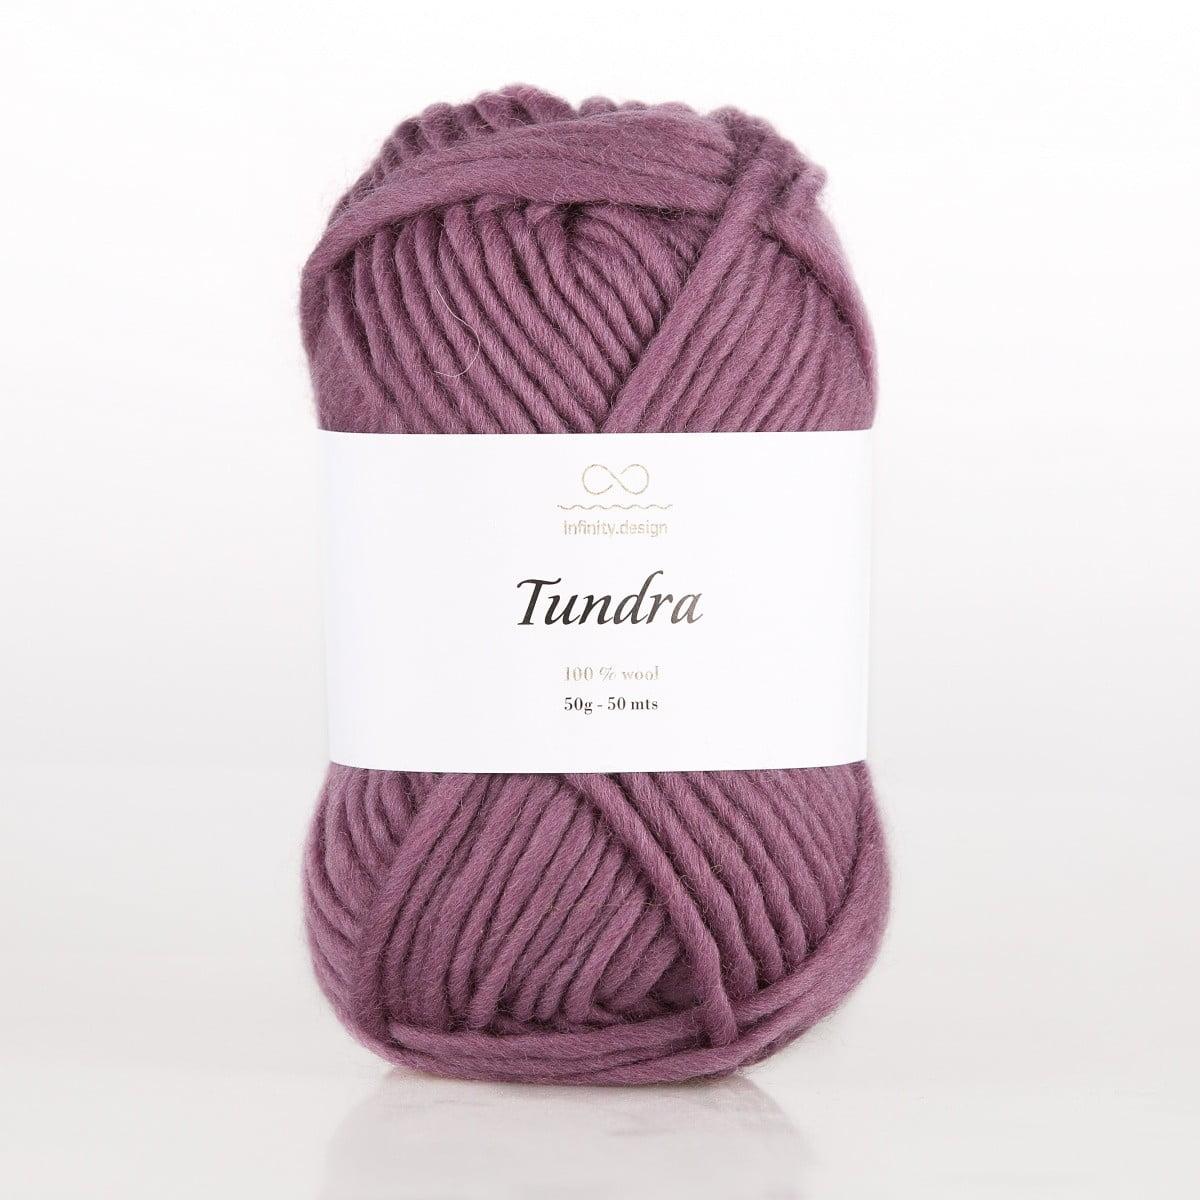 Пряжа Tundra Infinity design